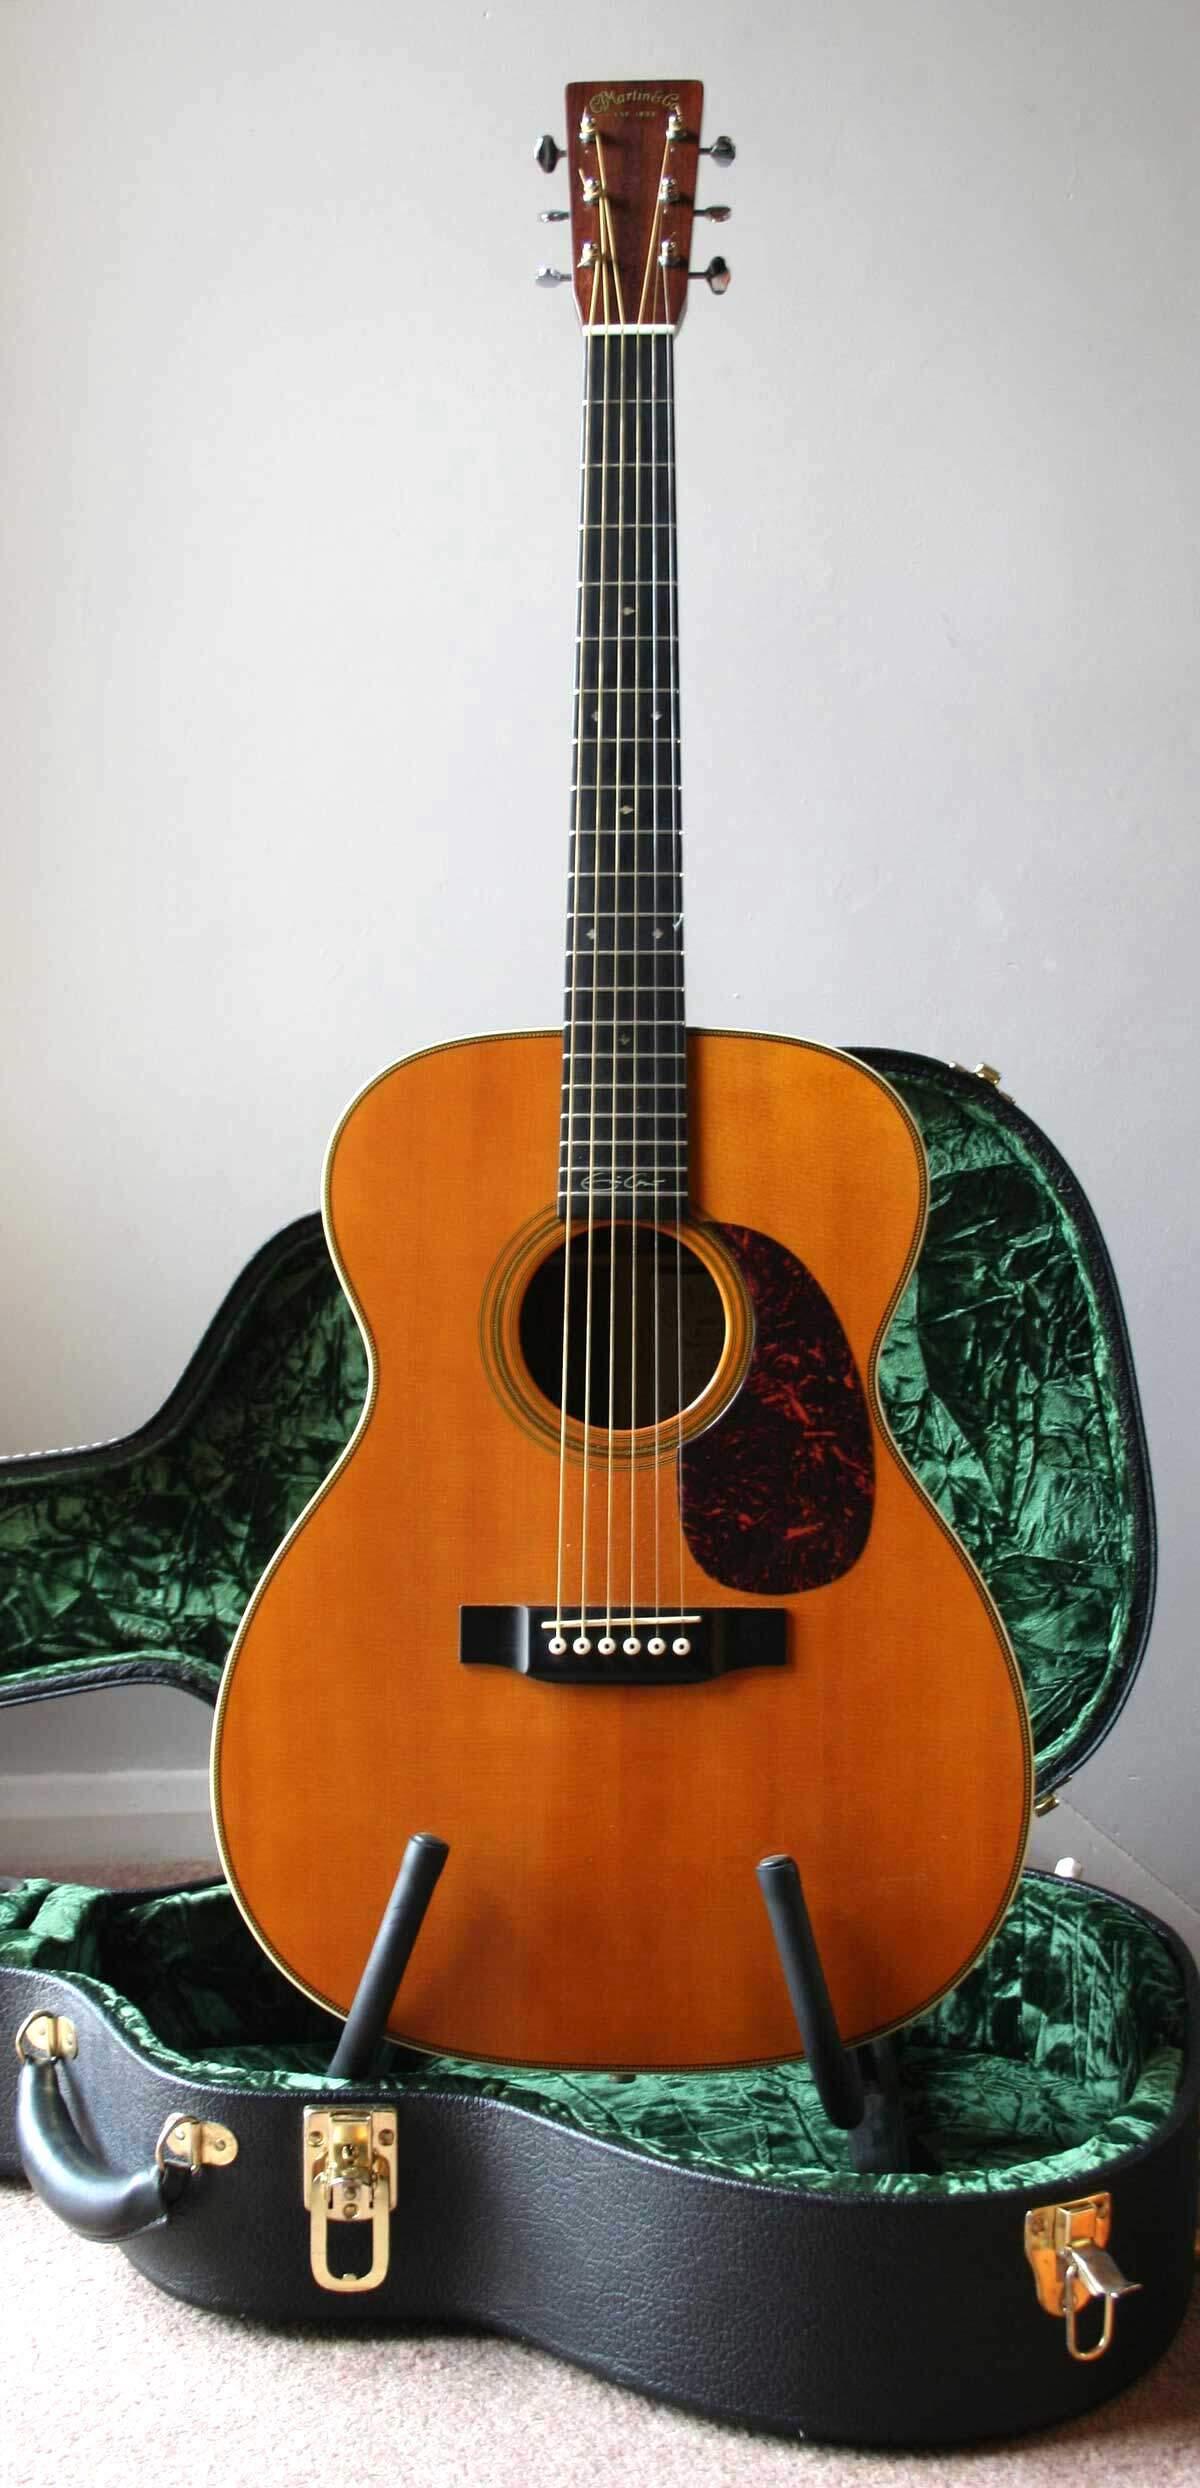 C.F._Martin_Model-000_Acoustic_Guitar